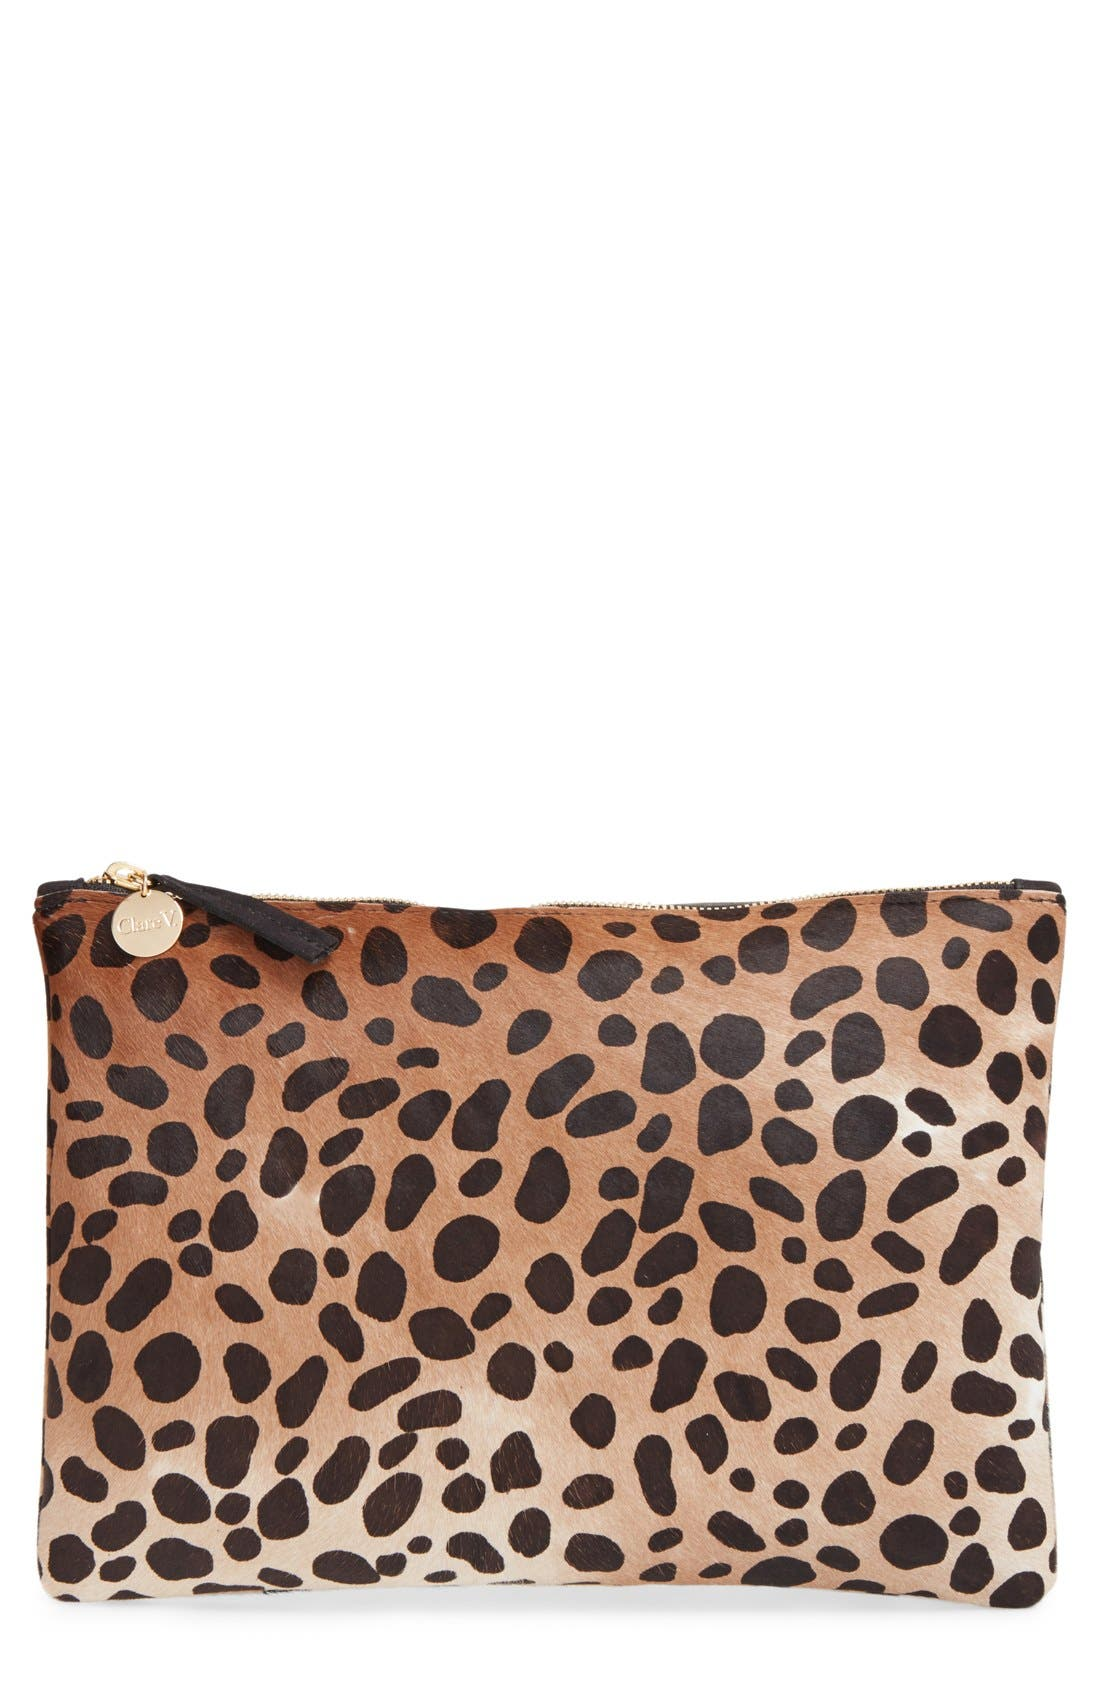 Main Image - Clare V. Genuine Calf Hair Leopard Print Zip Clutch